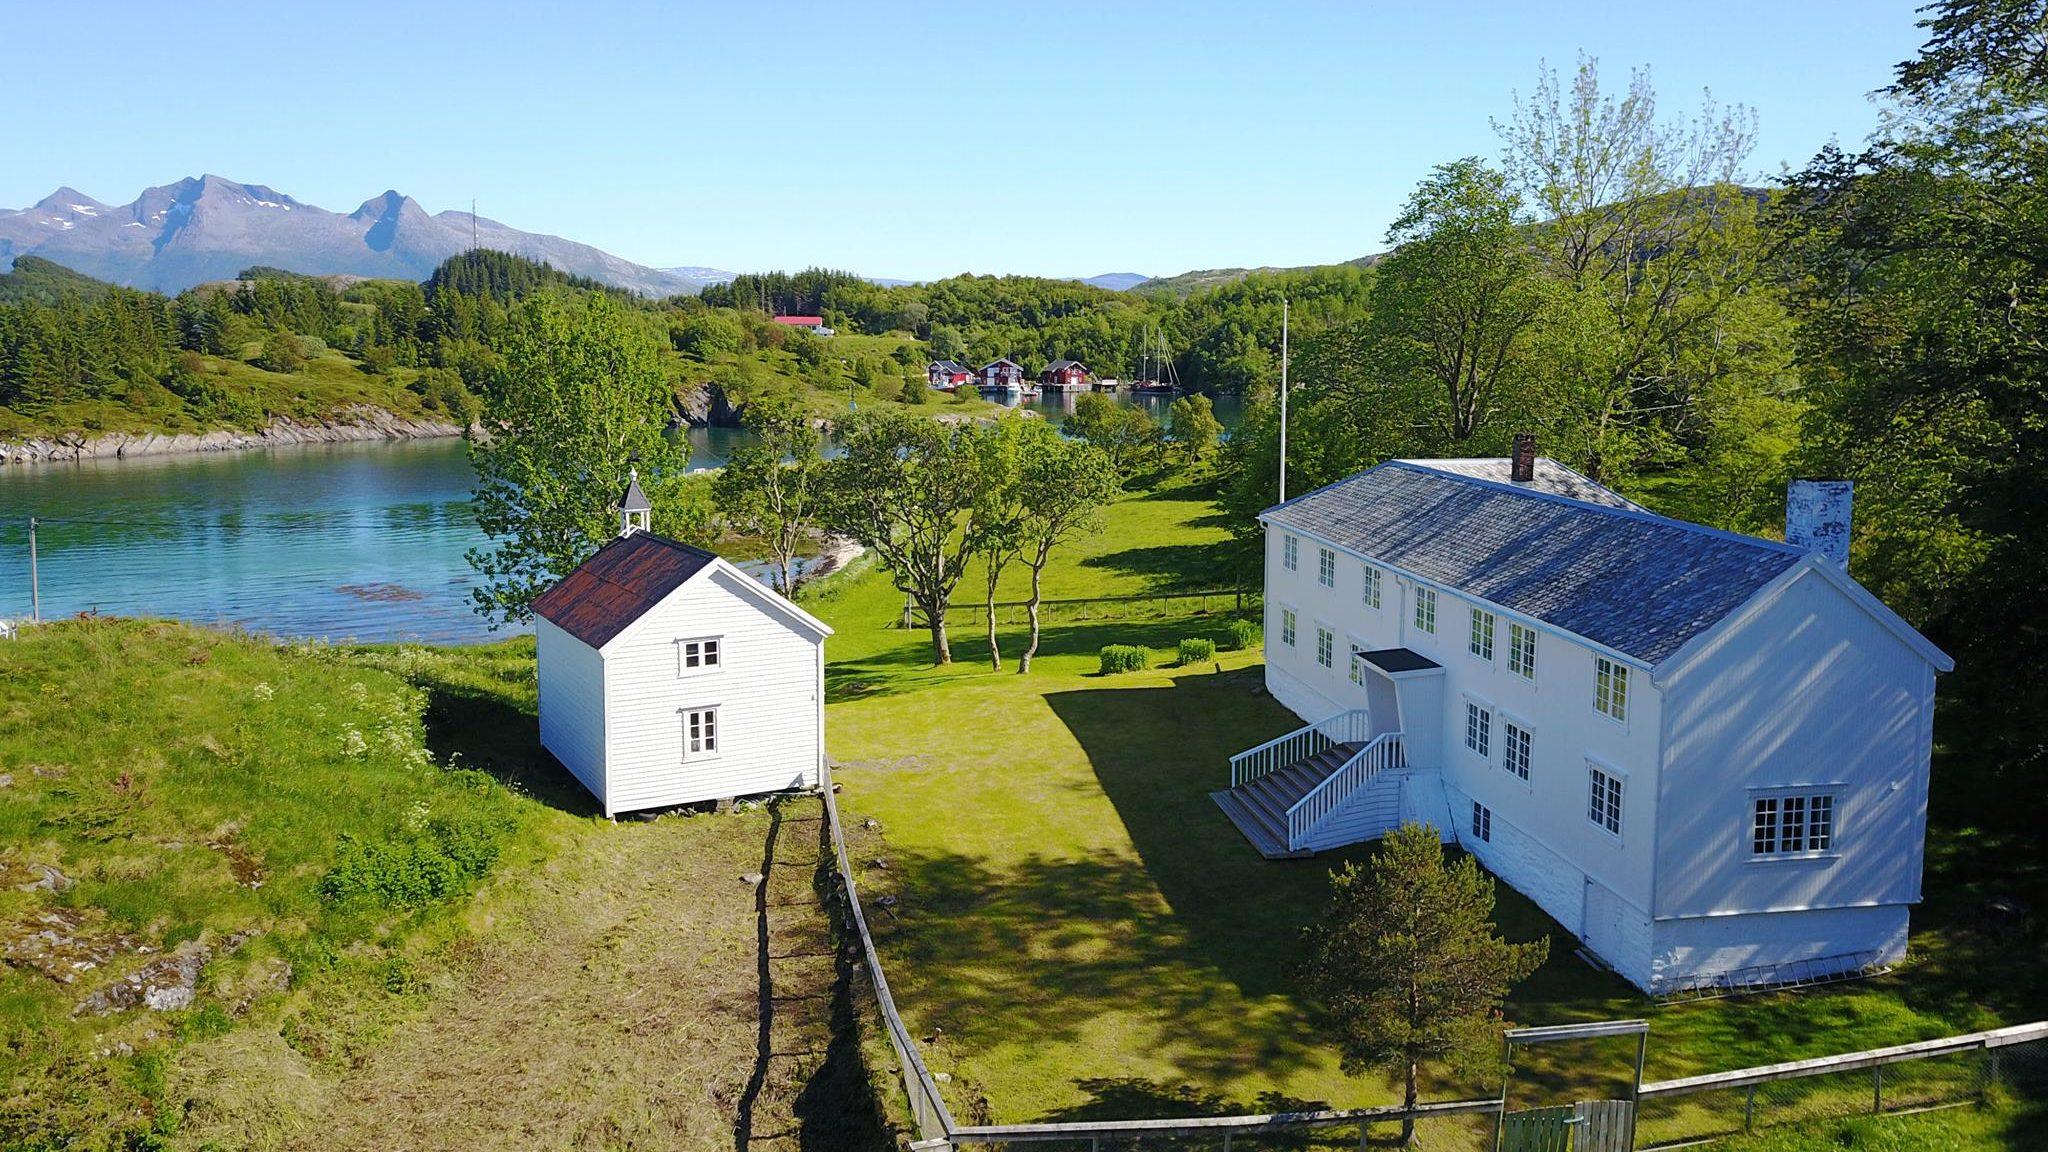 Røssøygården. Hvite bygninger med hage rundt.